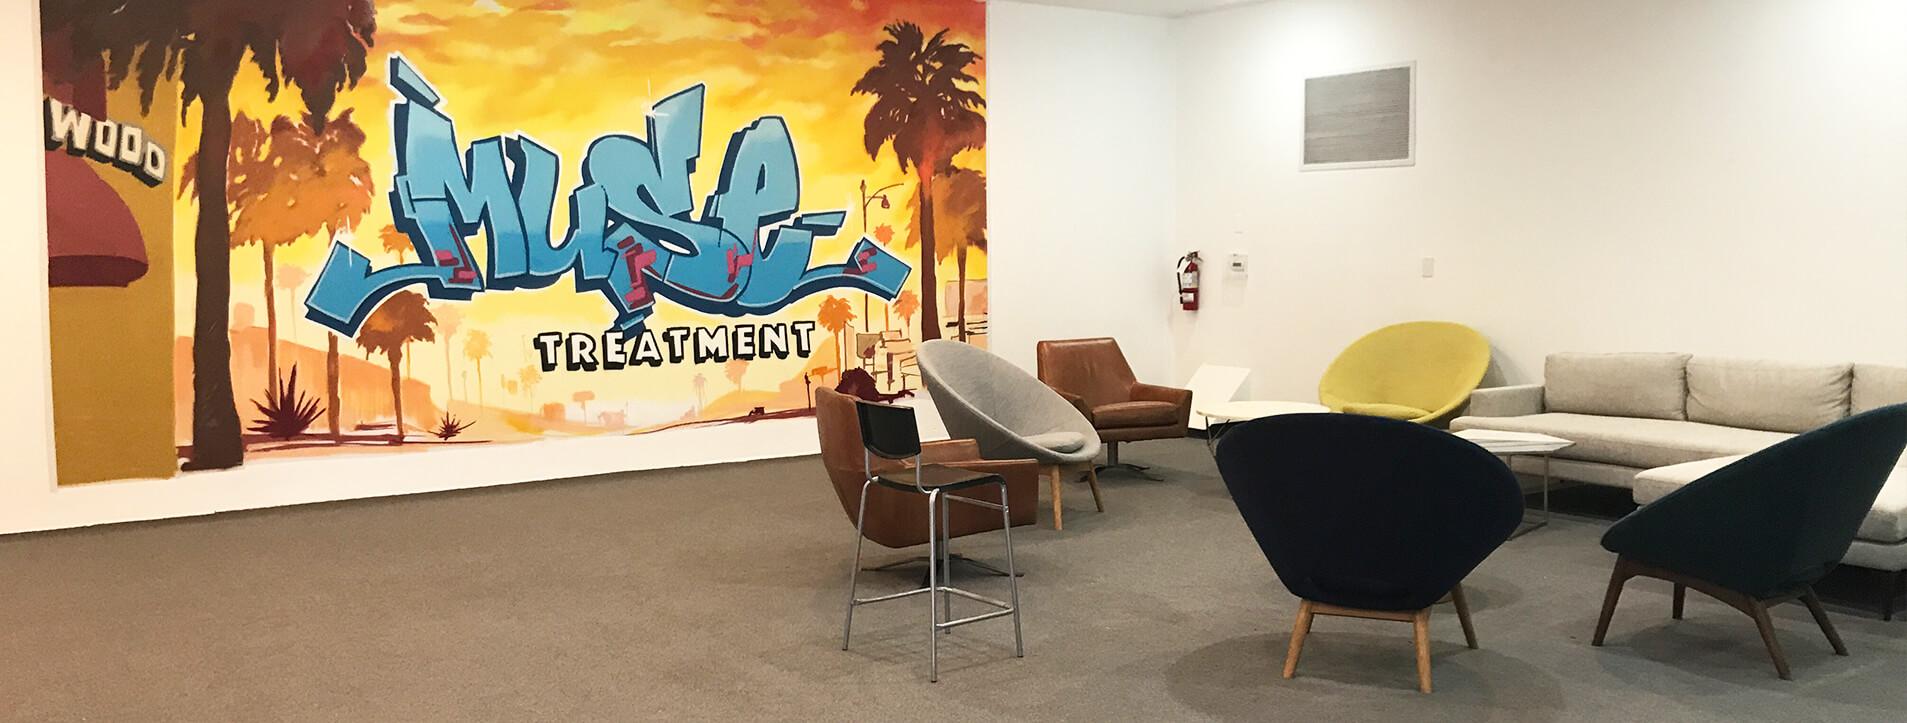 Muse Treatment Alcohol & Drug Rehab Los Angeles